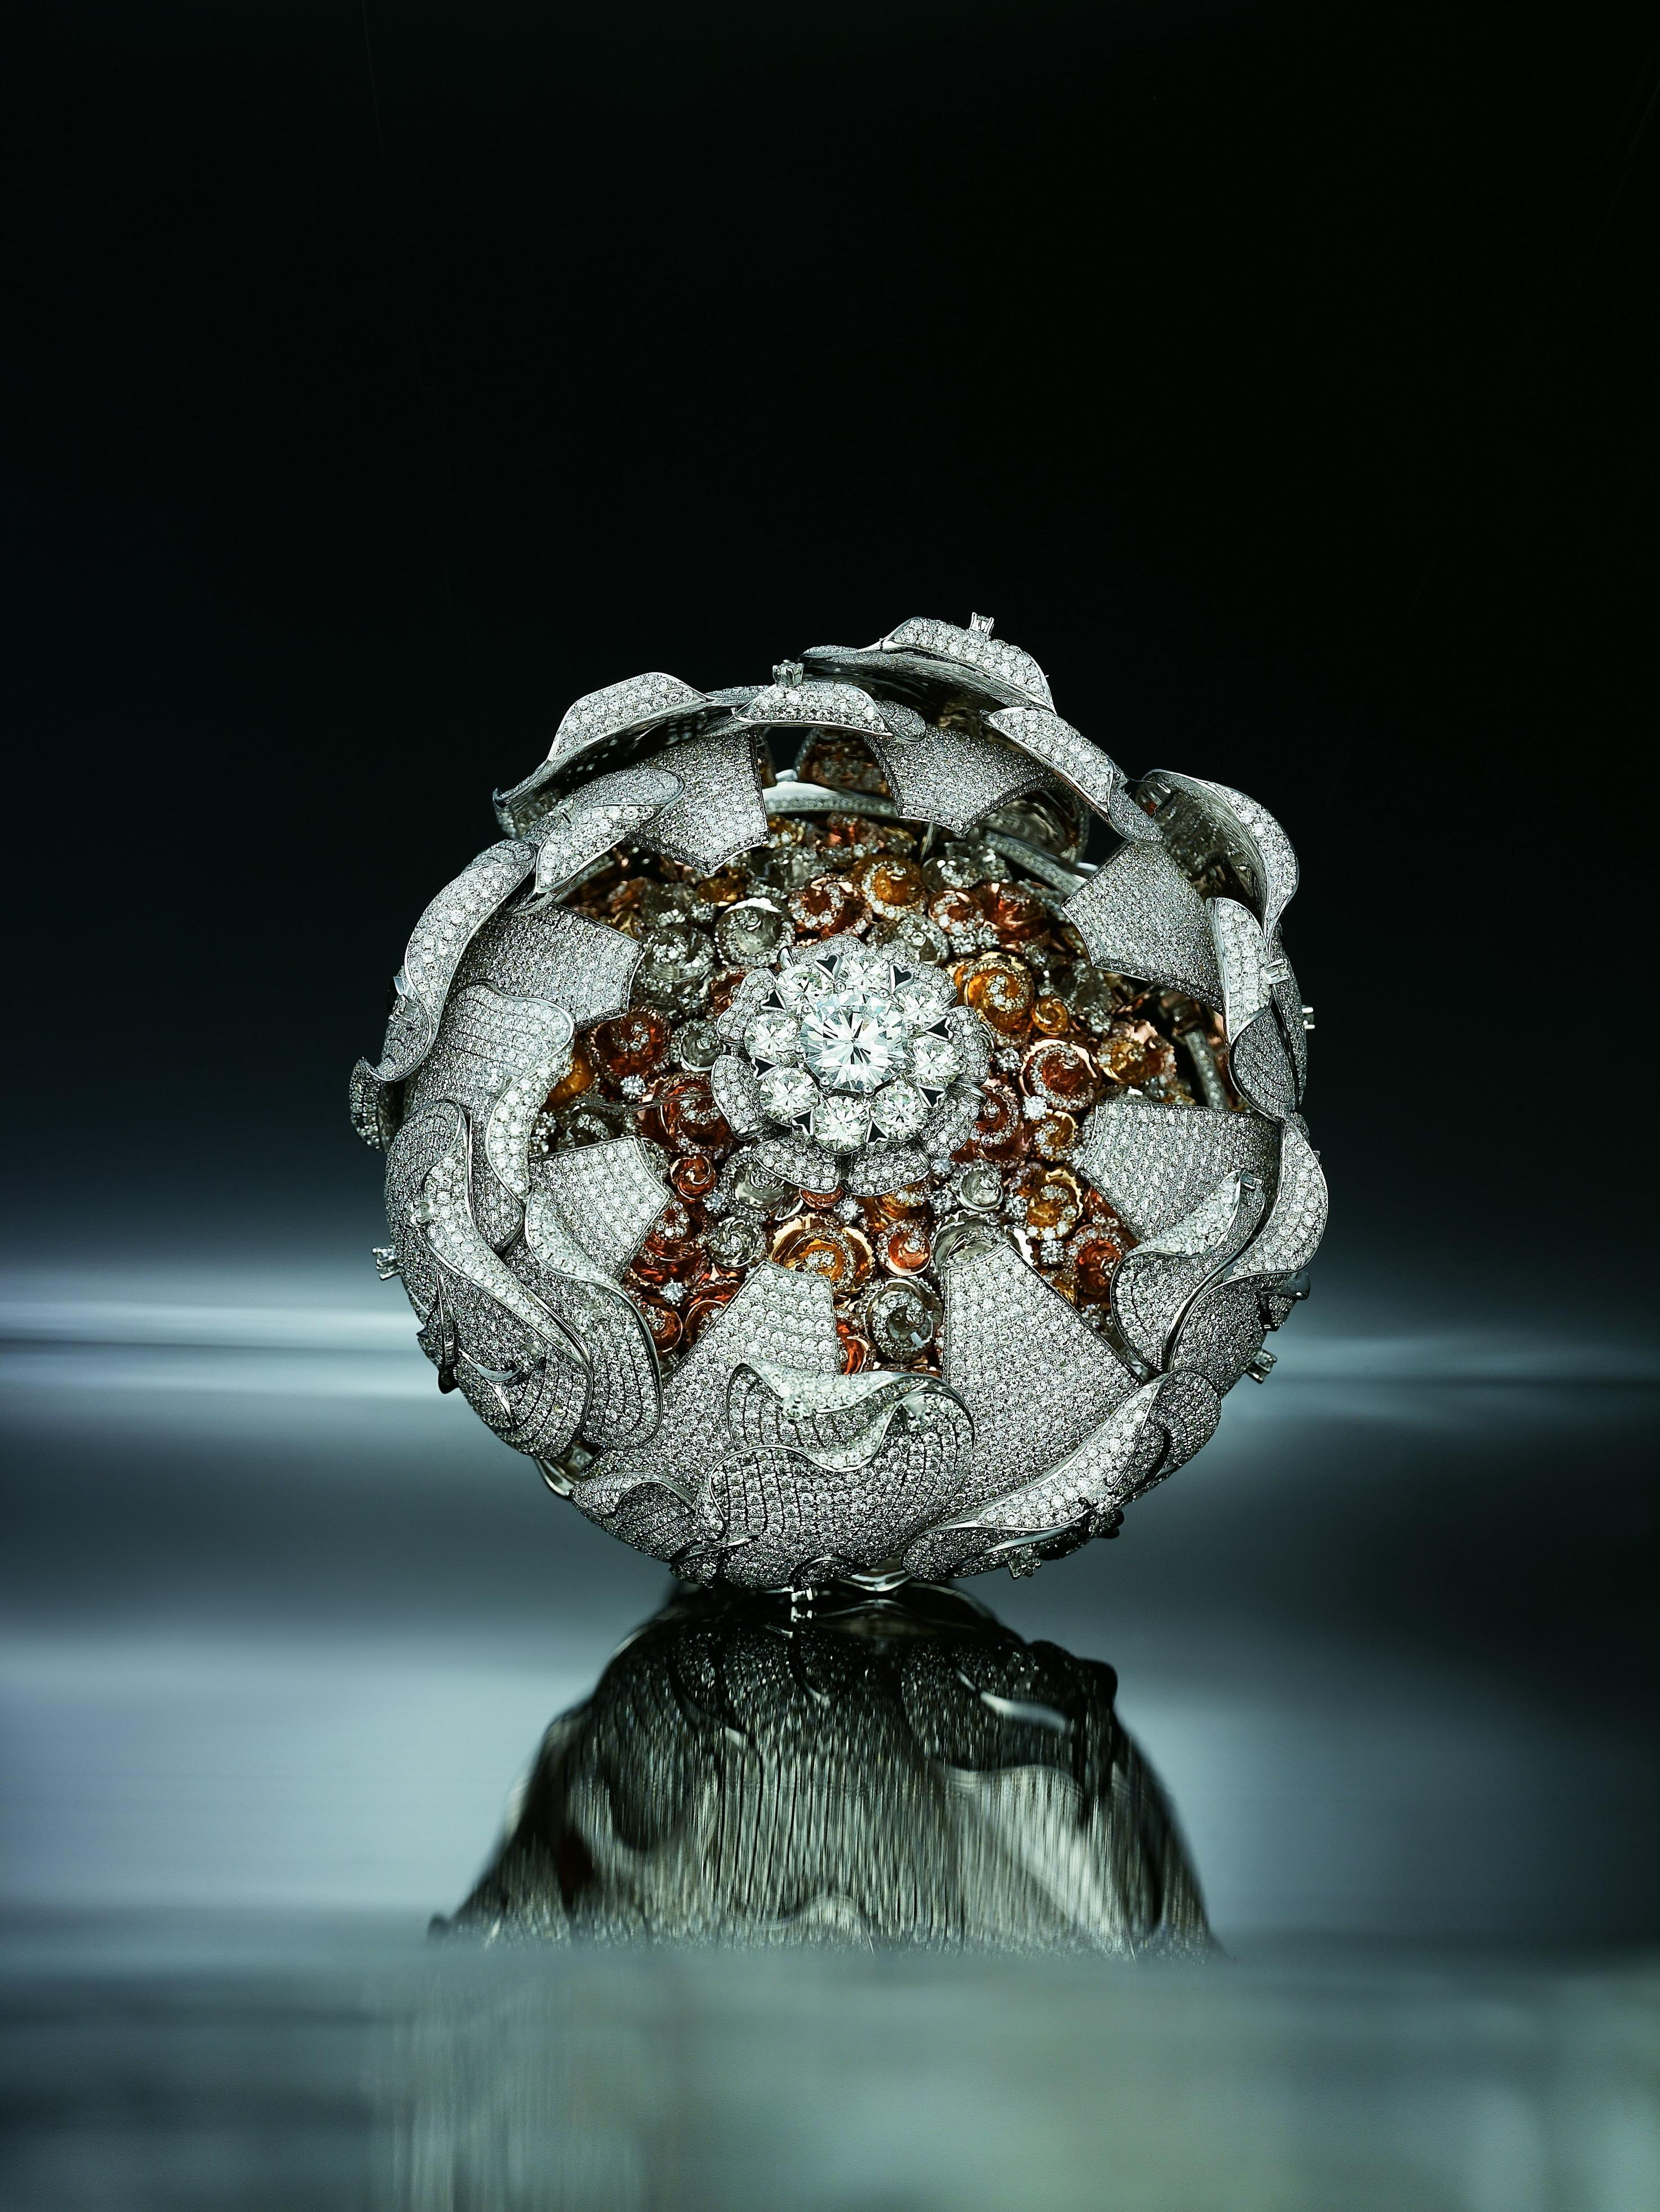 Hktdc Hong Kong International Jewellery Show Best Of